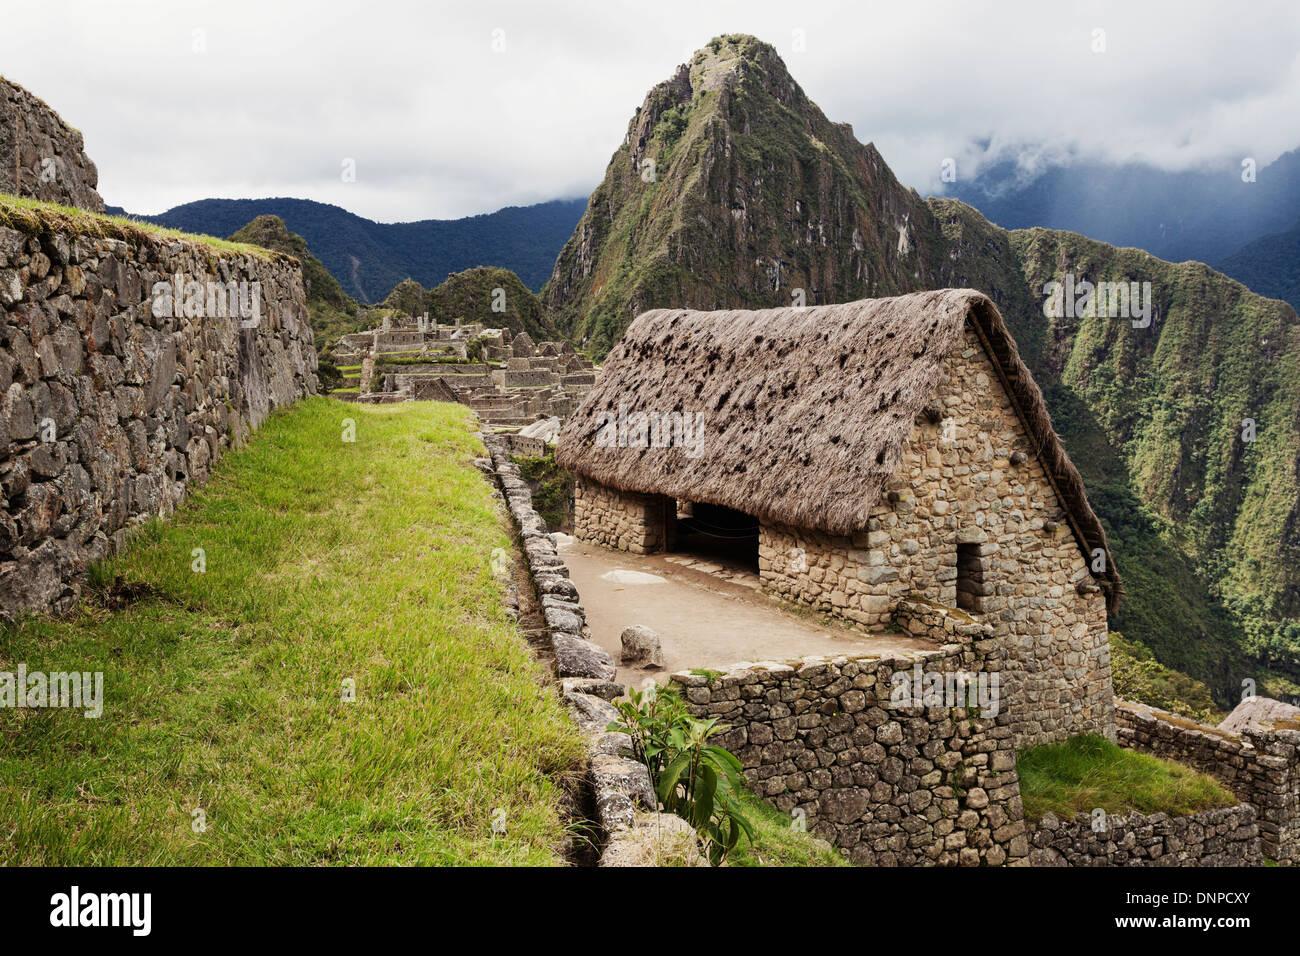 Mountain living near cusco peru royalty free stock photo - Peru Urubamba Province Cusco View To Machu Picchu